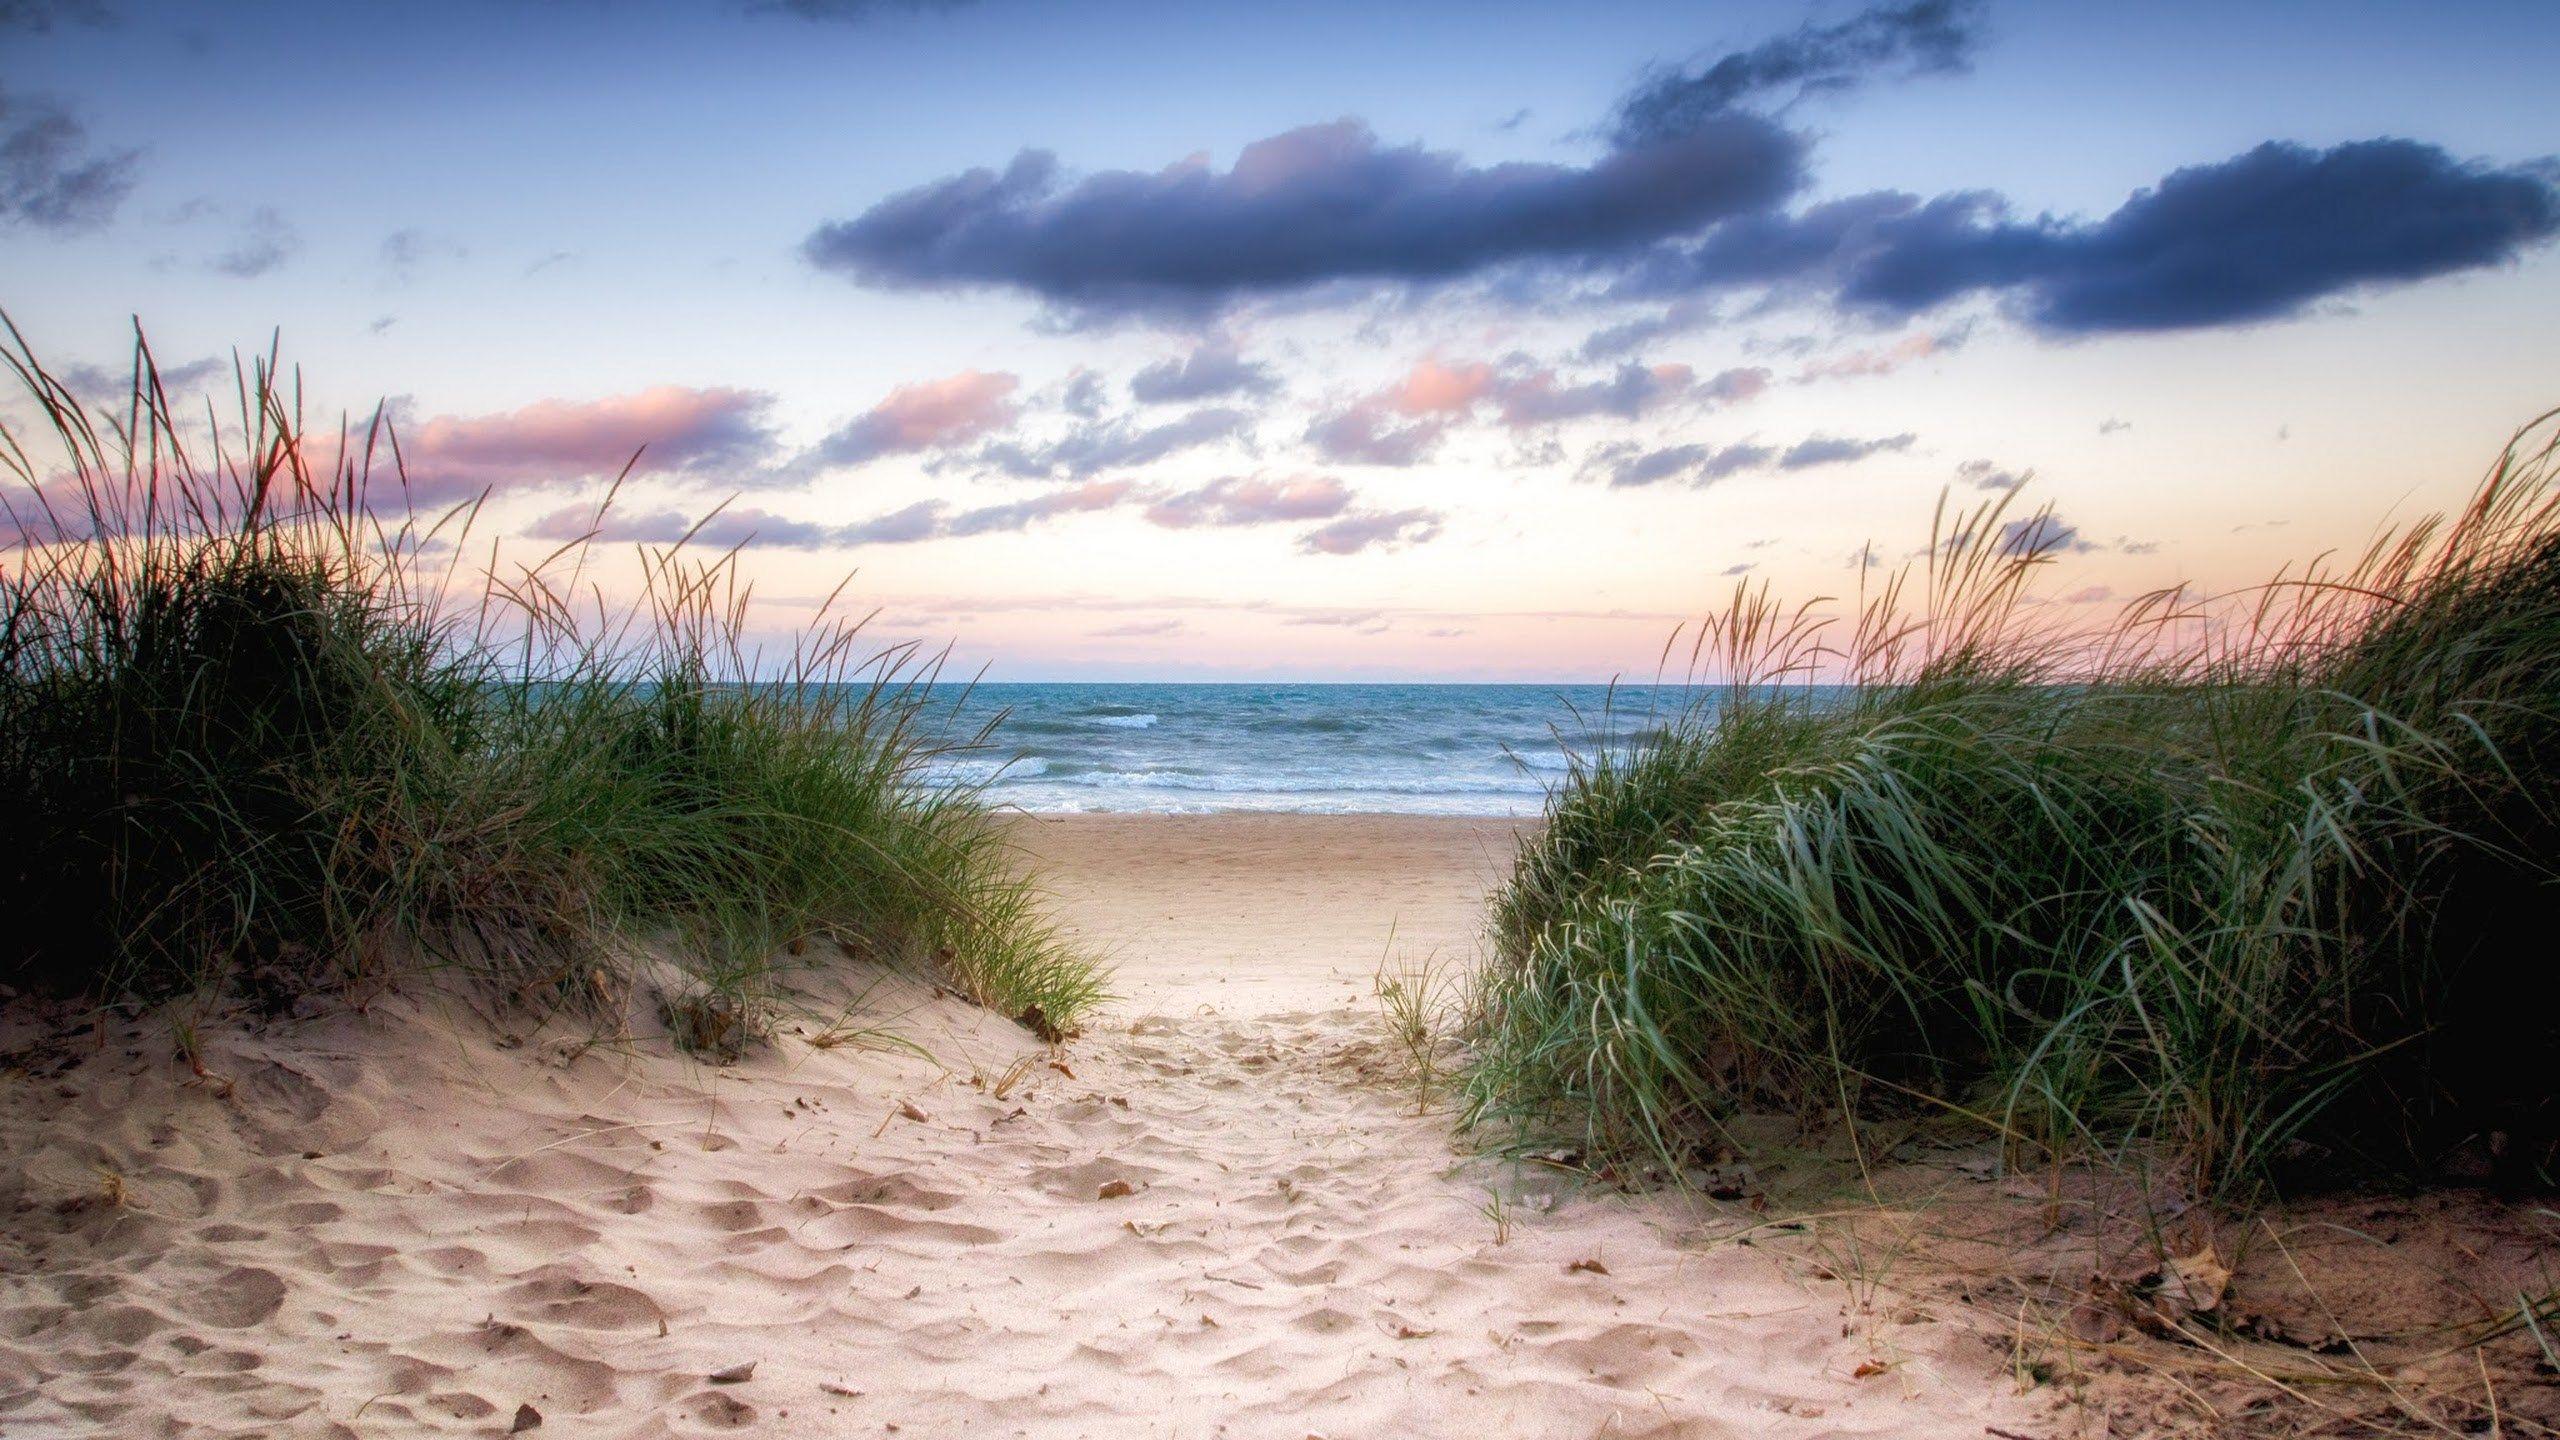 Free screensaver beach Beach wallpaper